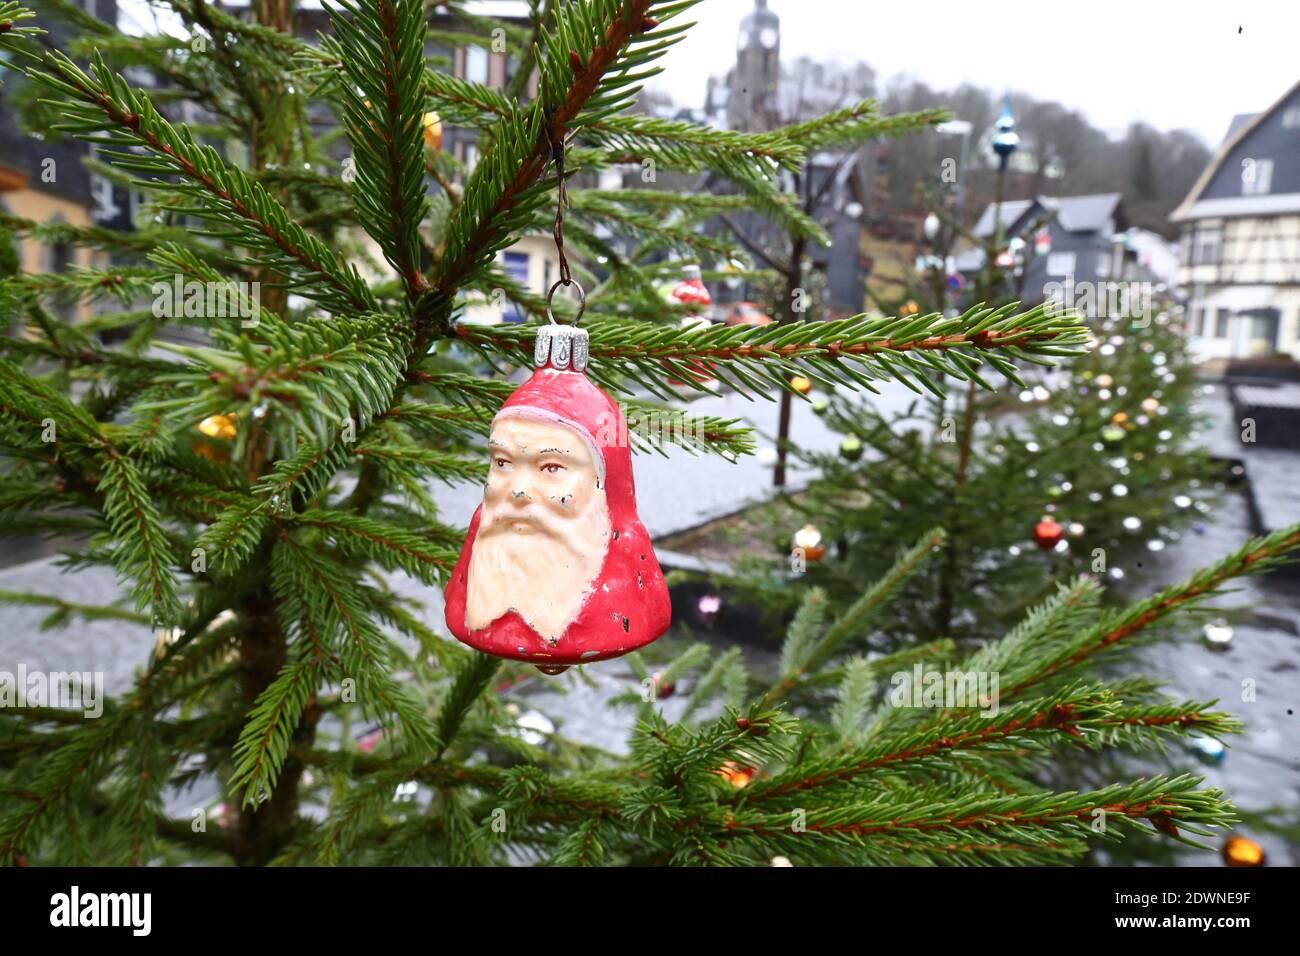 Sapin De Noël Pointe Lauscha Thüringer or rouge sapin Arbre De Noël Pointe